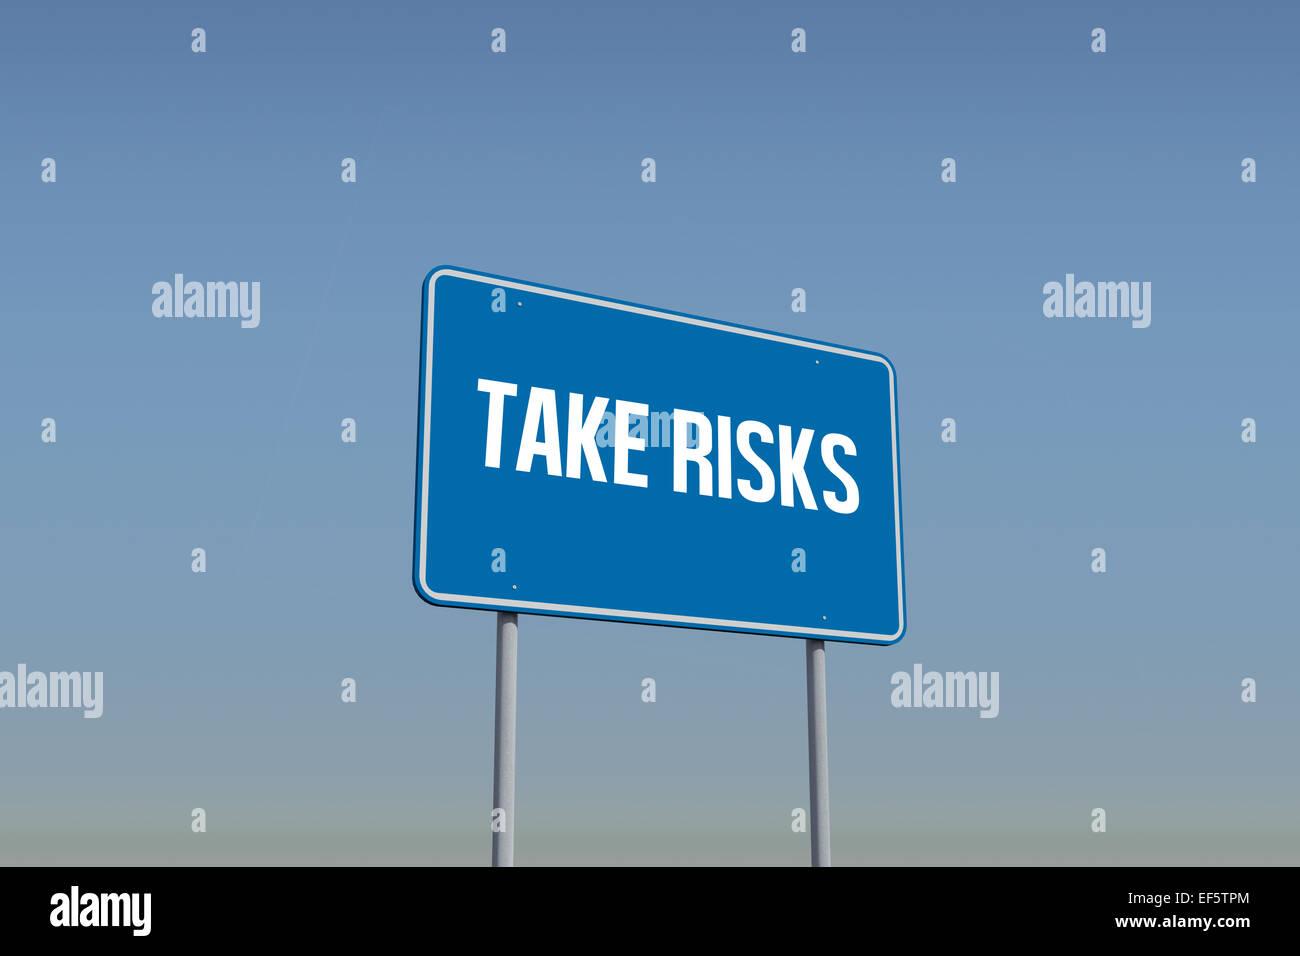 Take risks against blue sky - Stock Image